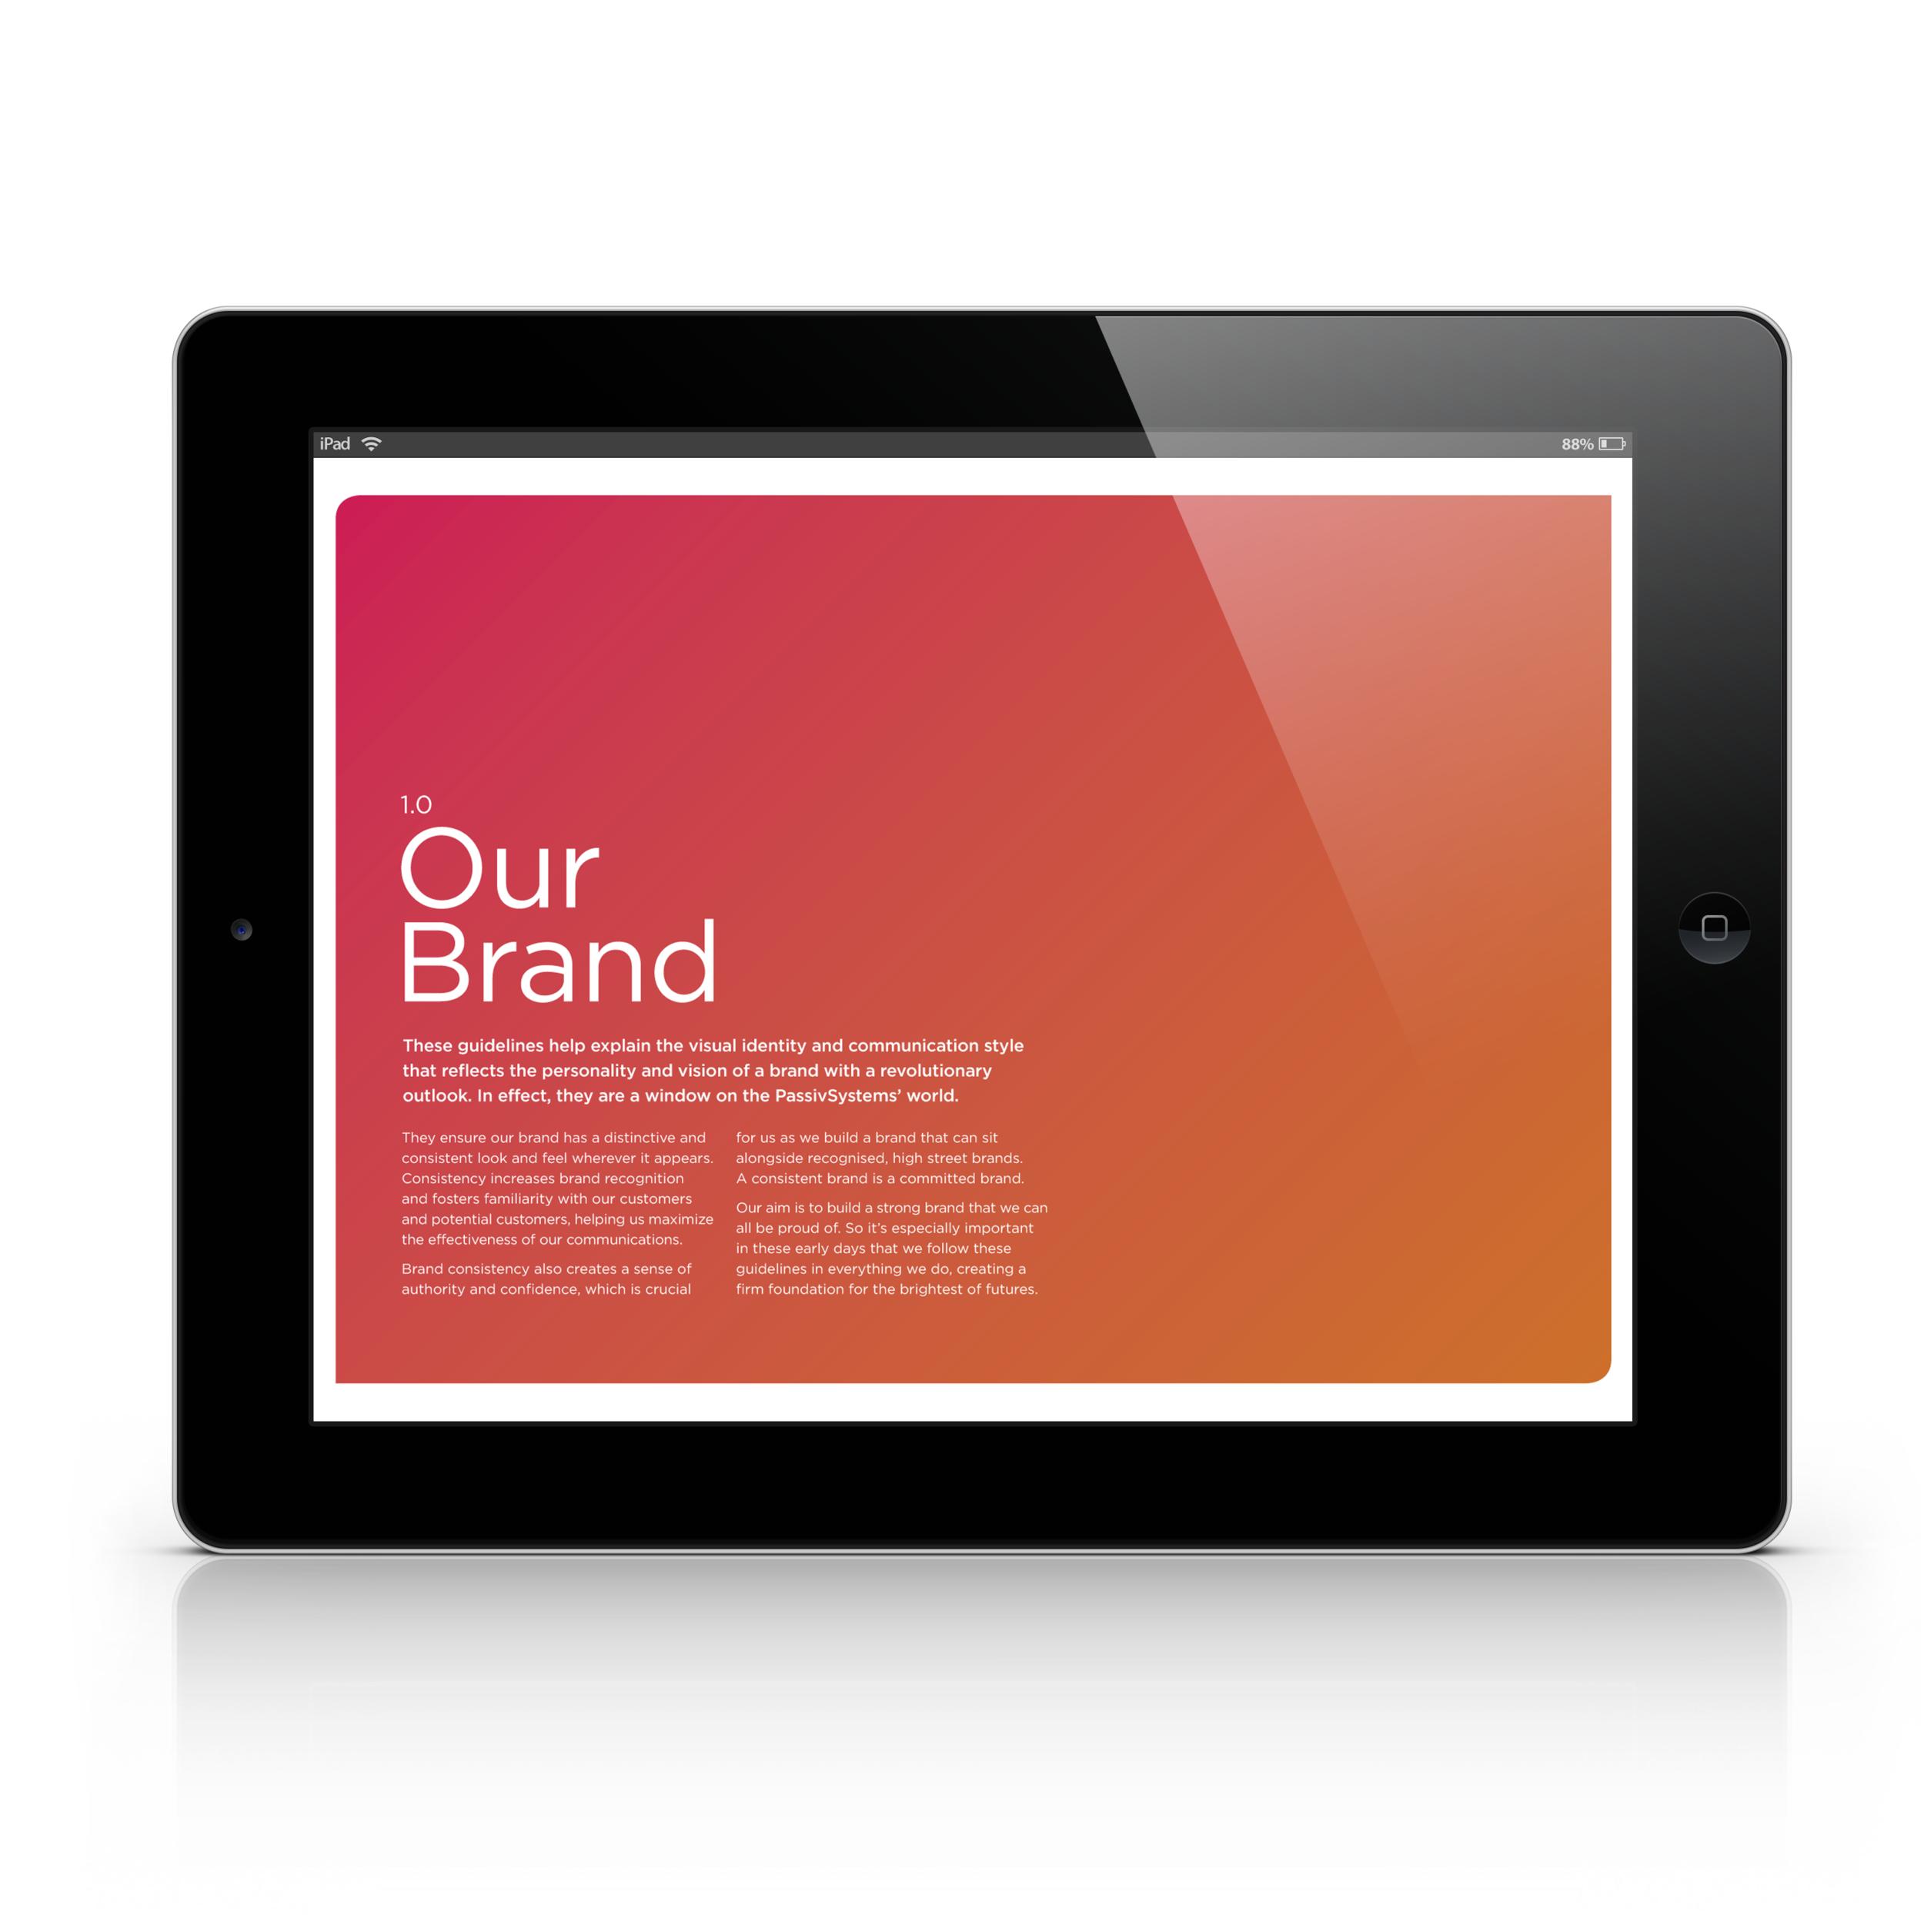 iPad-Landscape-Retina-Display-Mockup2.png